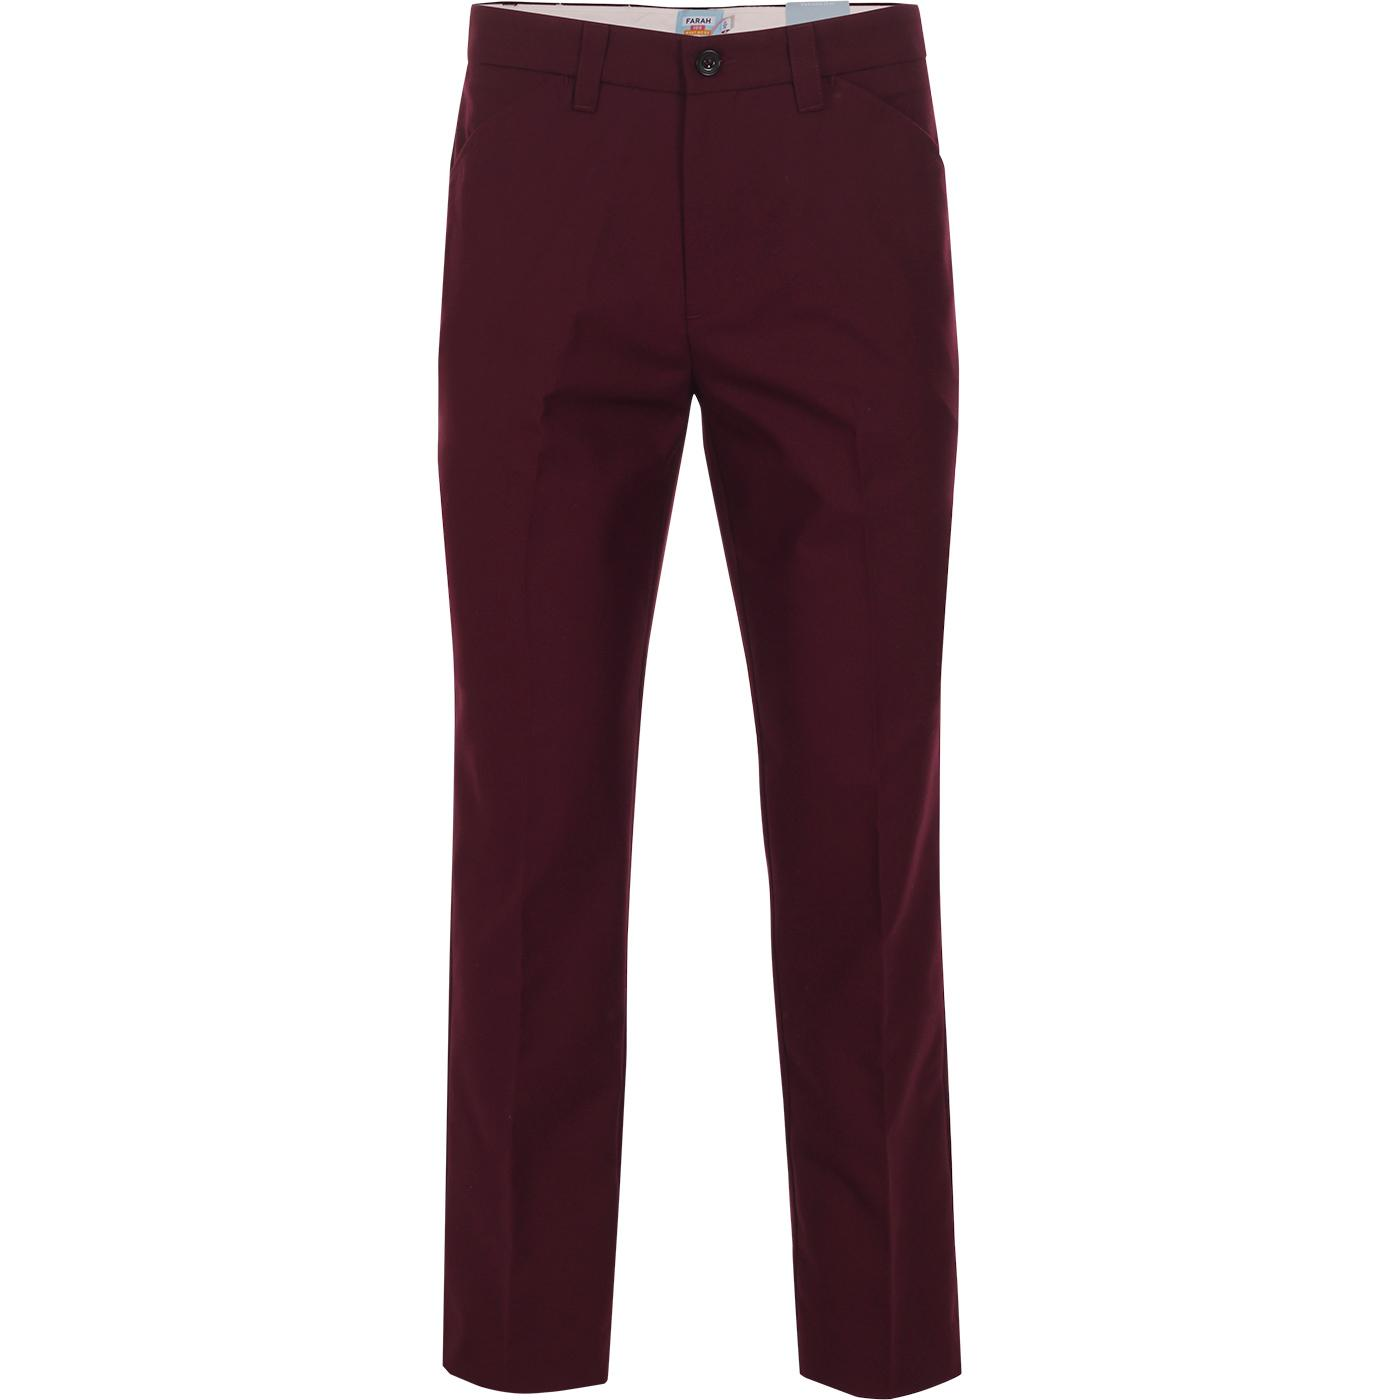 FARAH 100 Original Hopsack Weave Mod Trousers (R)